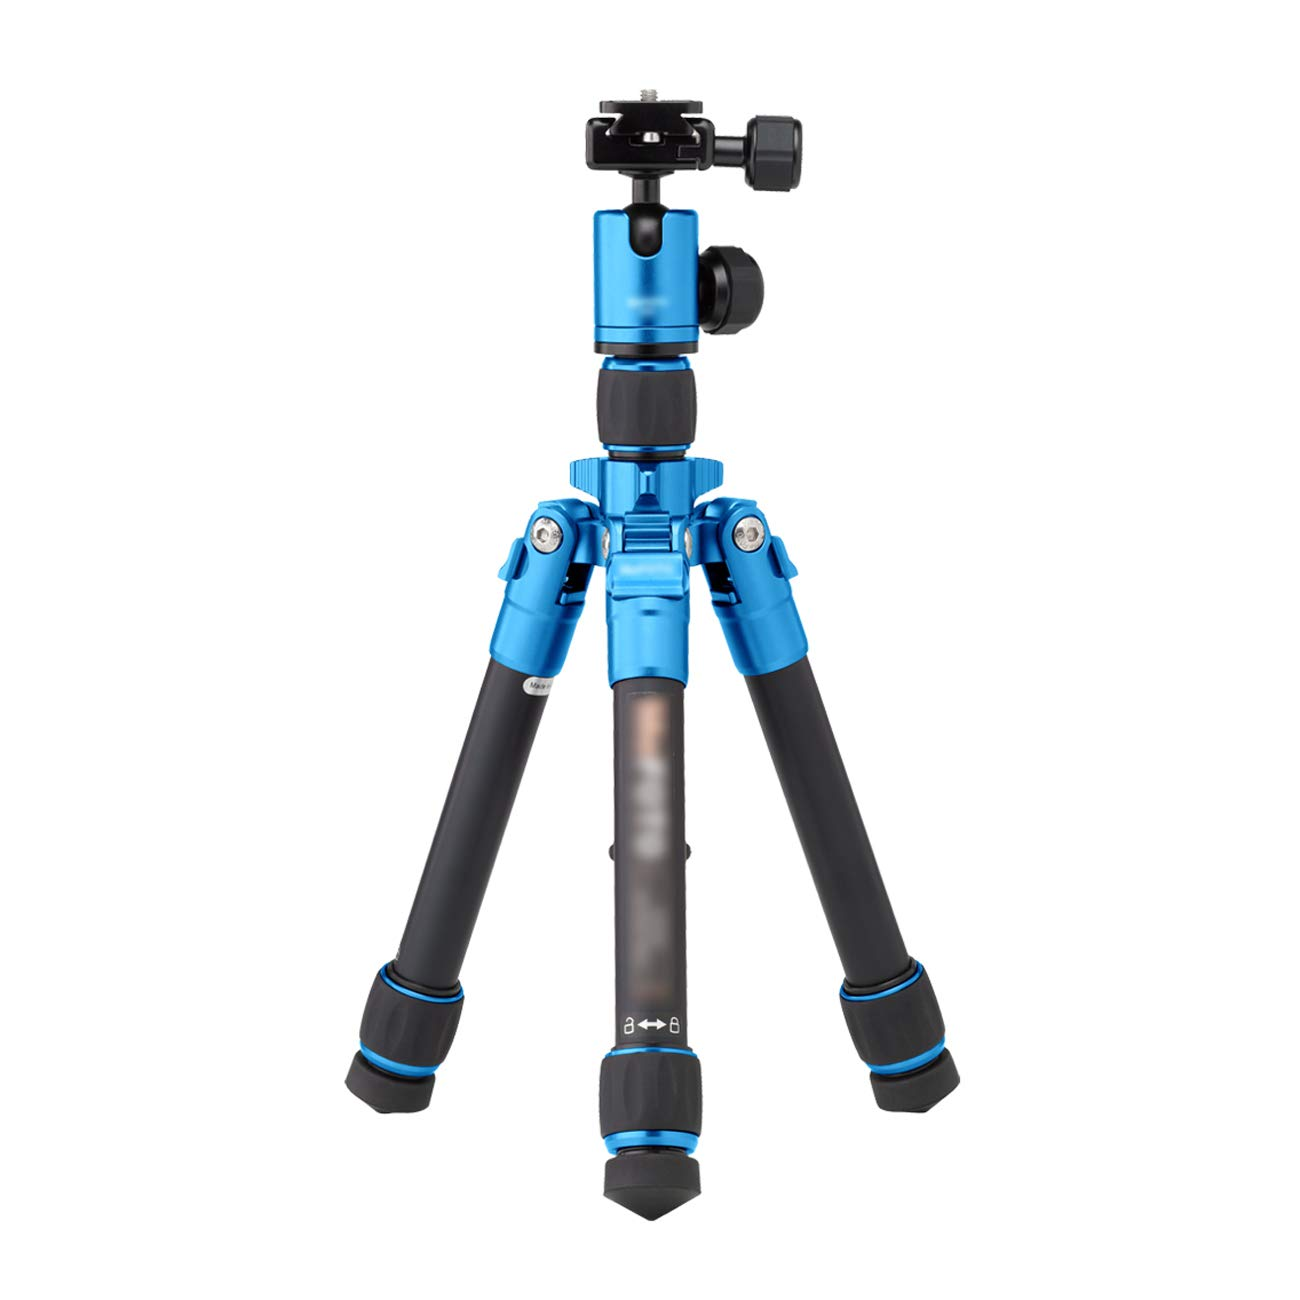 CJGXJZJ カメラ三脚 コンパクトで軽量 旅行用 アルミブラケット ポータブル デスクトップ 旅行 ストリートビート トライアングルブラケット 最大負荷 4KG マルチカラーオプション ブルー CHJG45648256  ブルー B07L8C8RNL